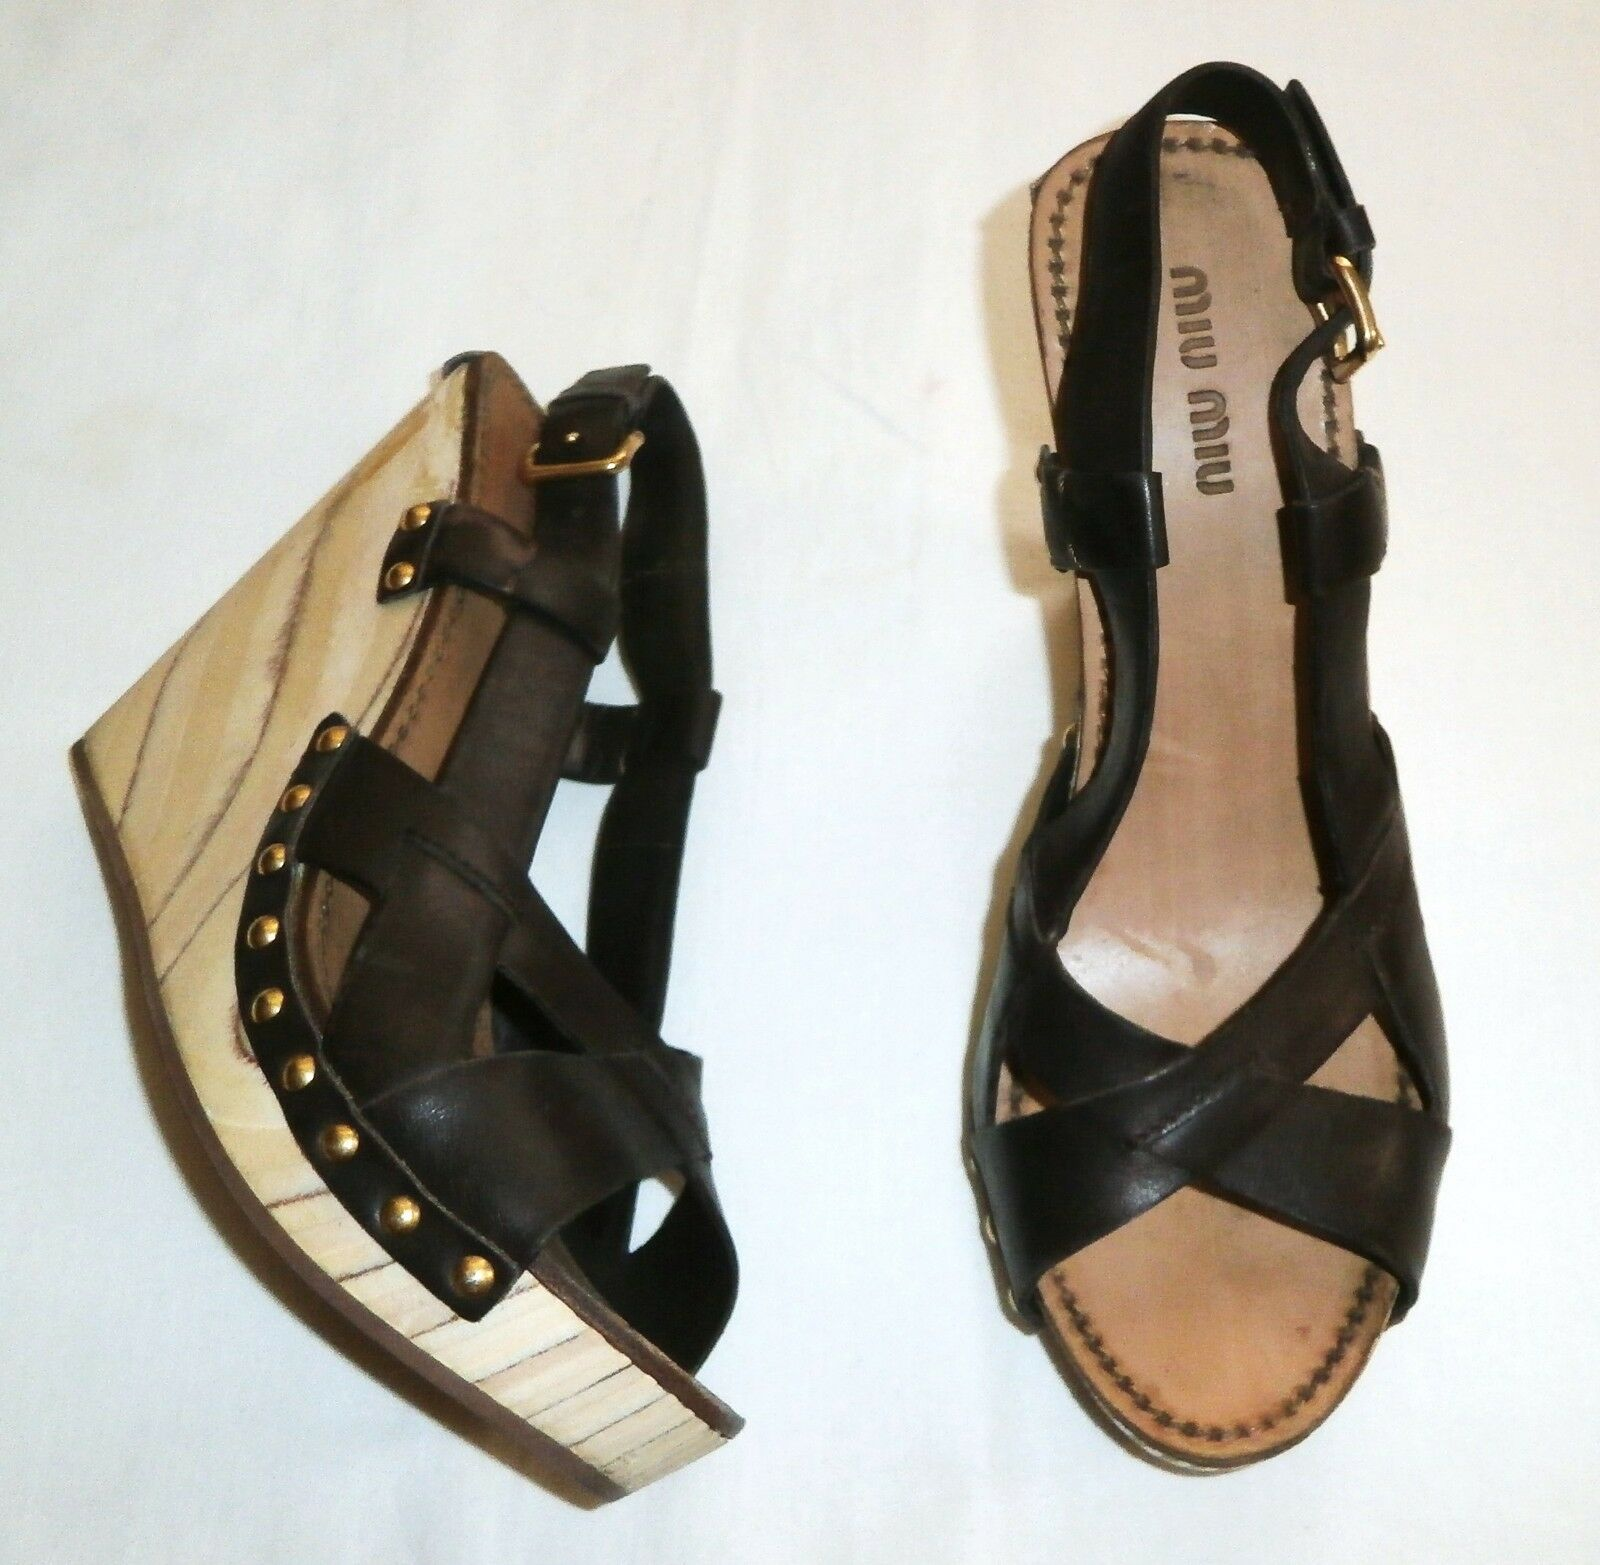 miu miu  Braun Leder Wedge Sandales  US: 6 ; EUR: 36  AUTHENTIC